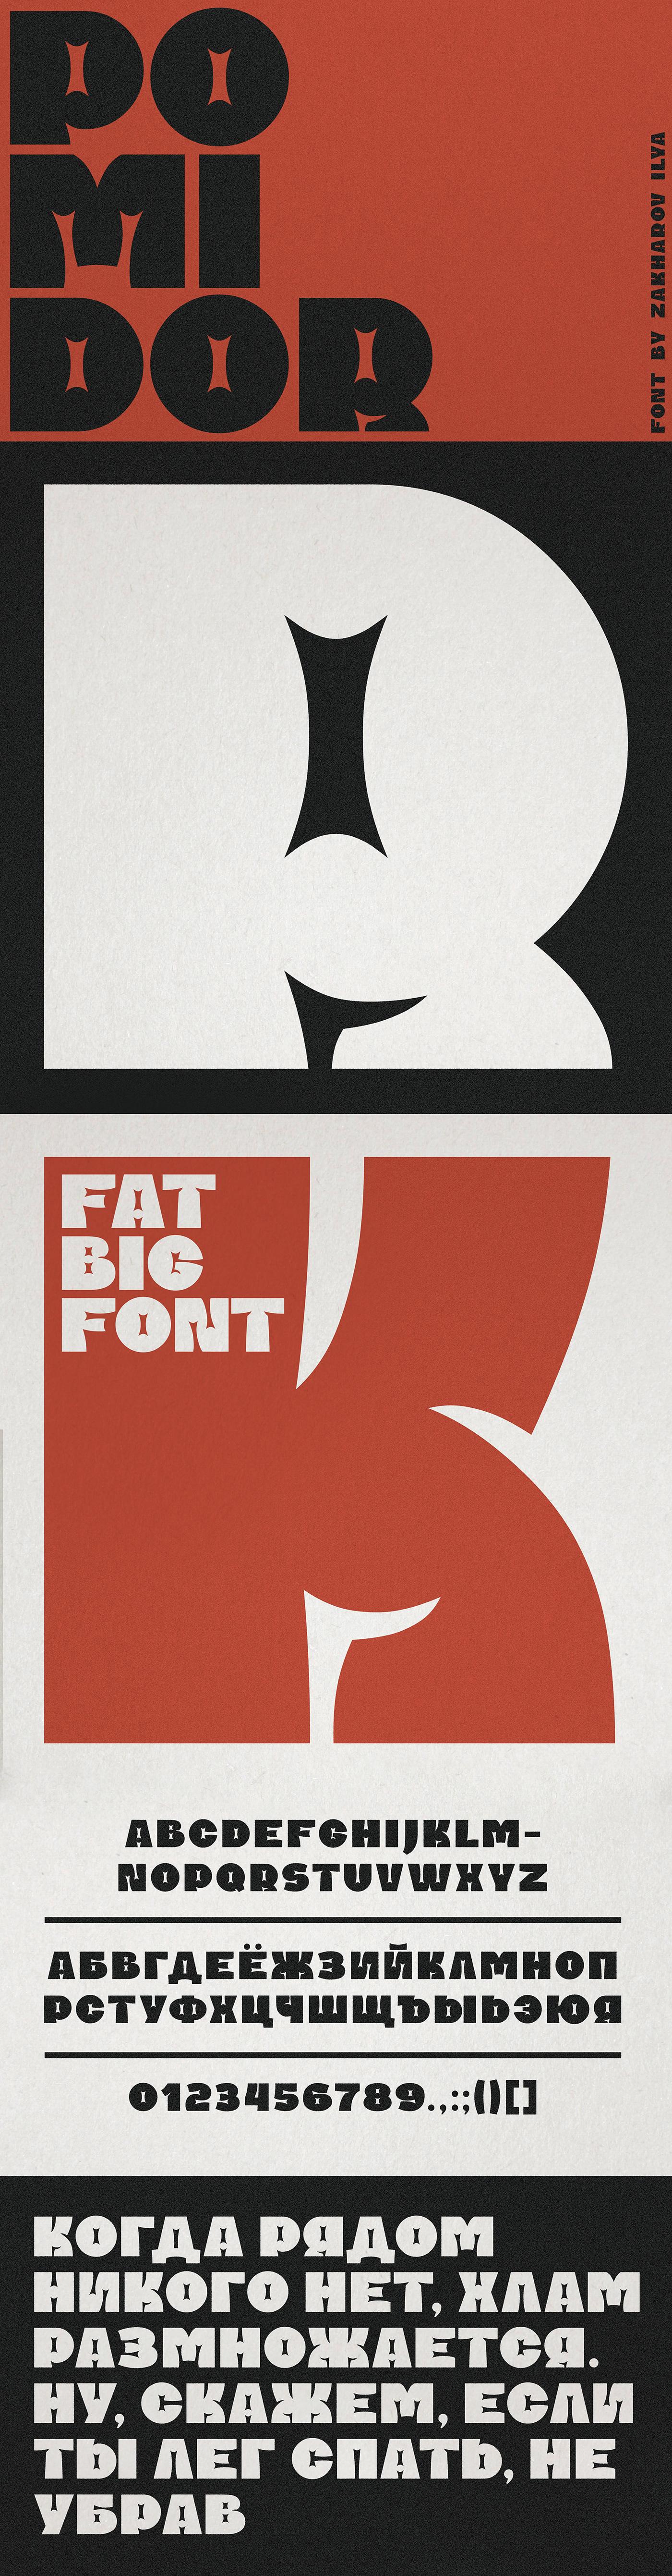 bold Display Fat font free Free font free fonts freebie logo logo font Packaging